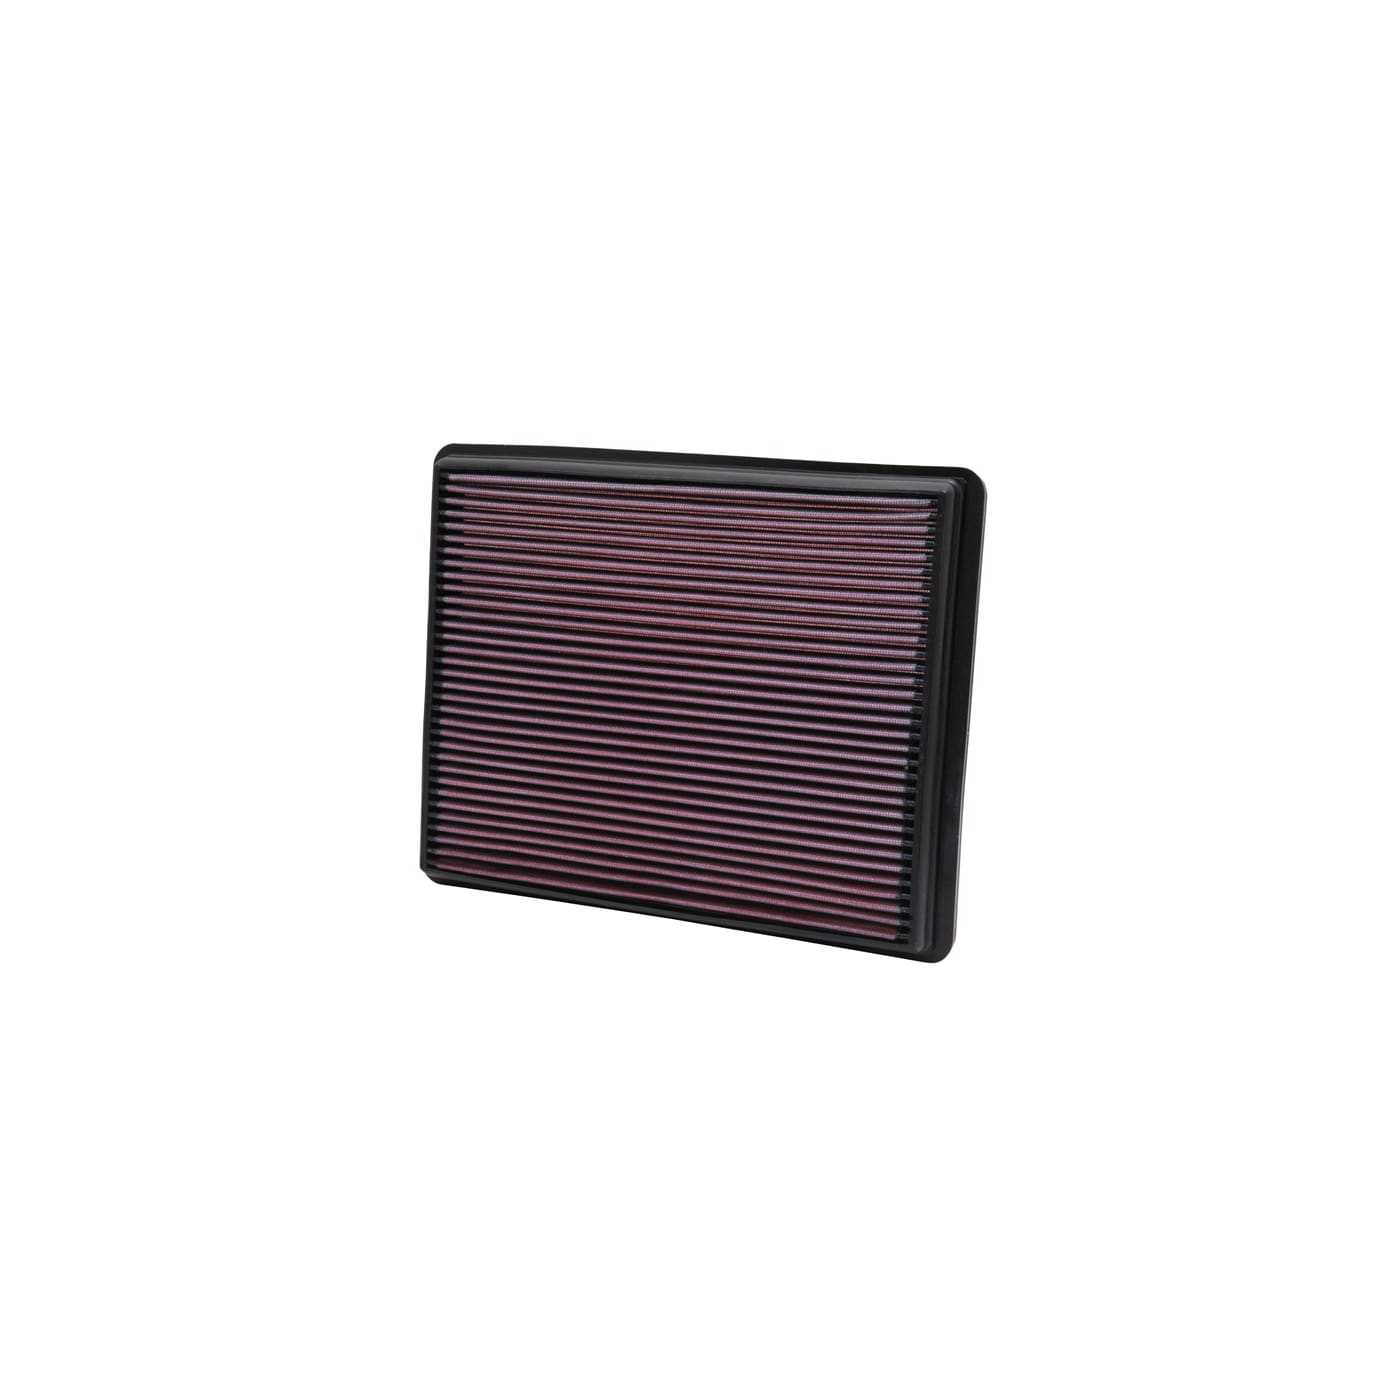 K/&N Filters 33-2129 Air Filter